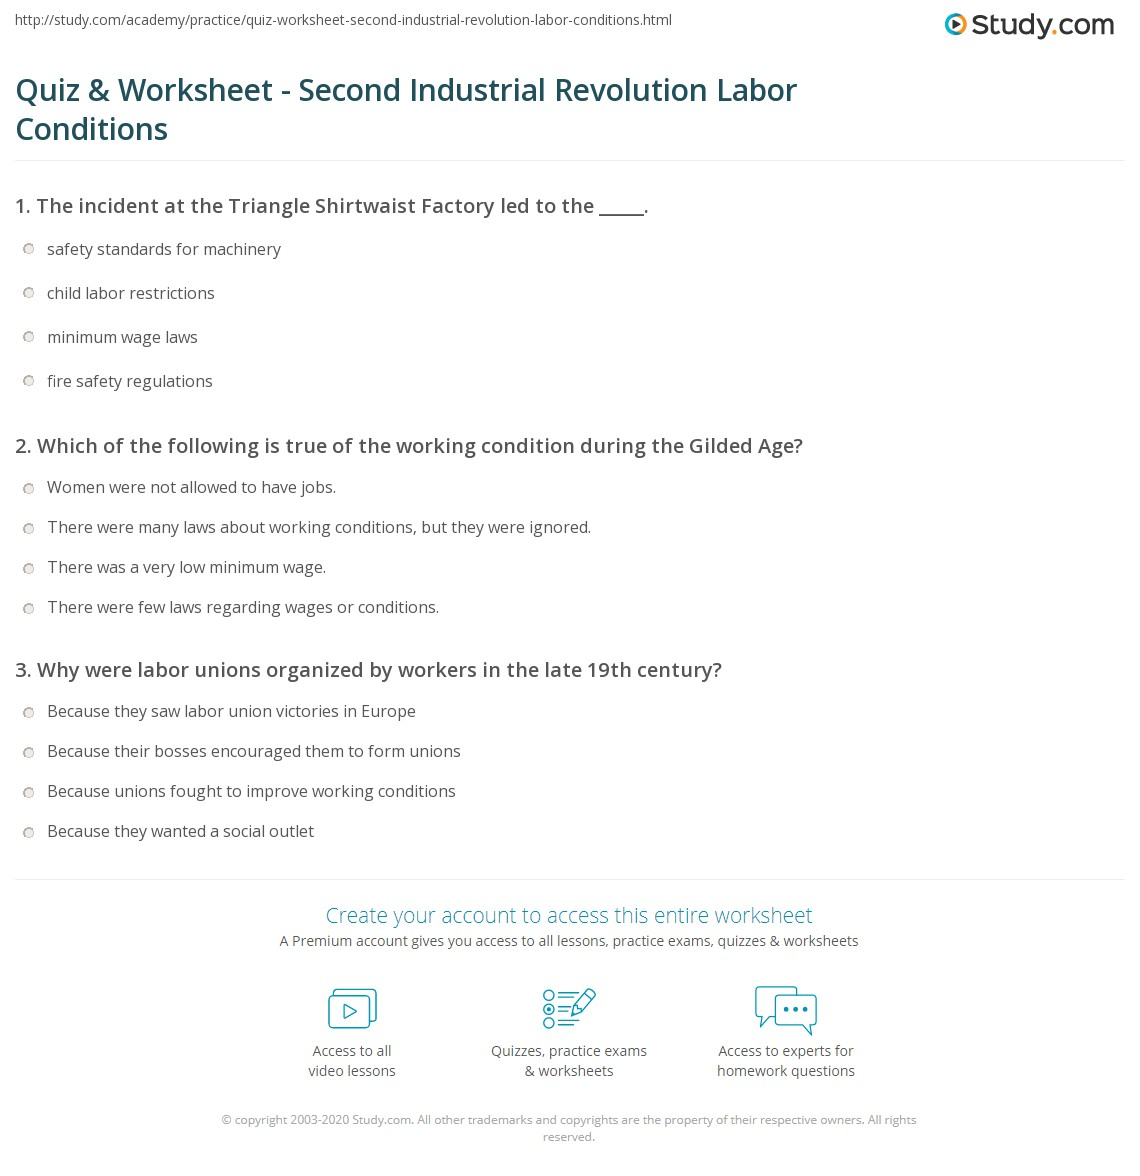 quiz worksheet second industrial revolution labor conditions. Black Bedroom Furniture Sets. Home Design Ideas